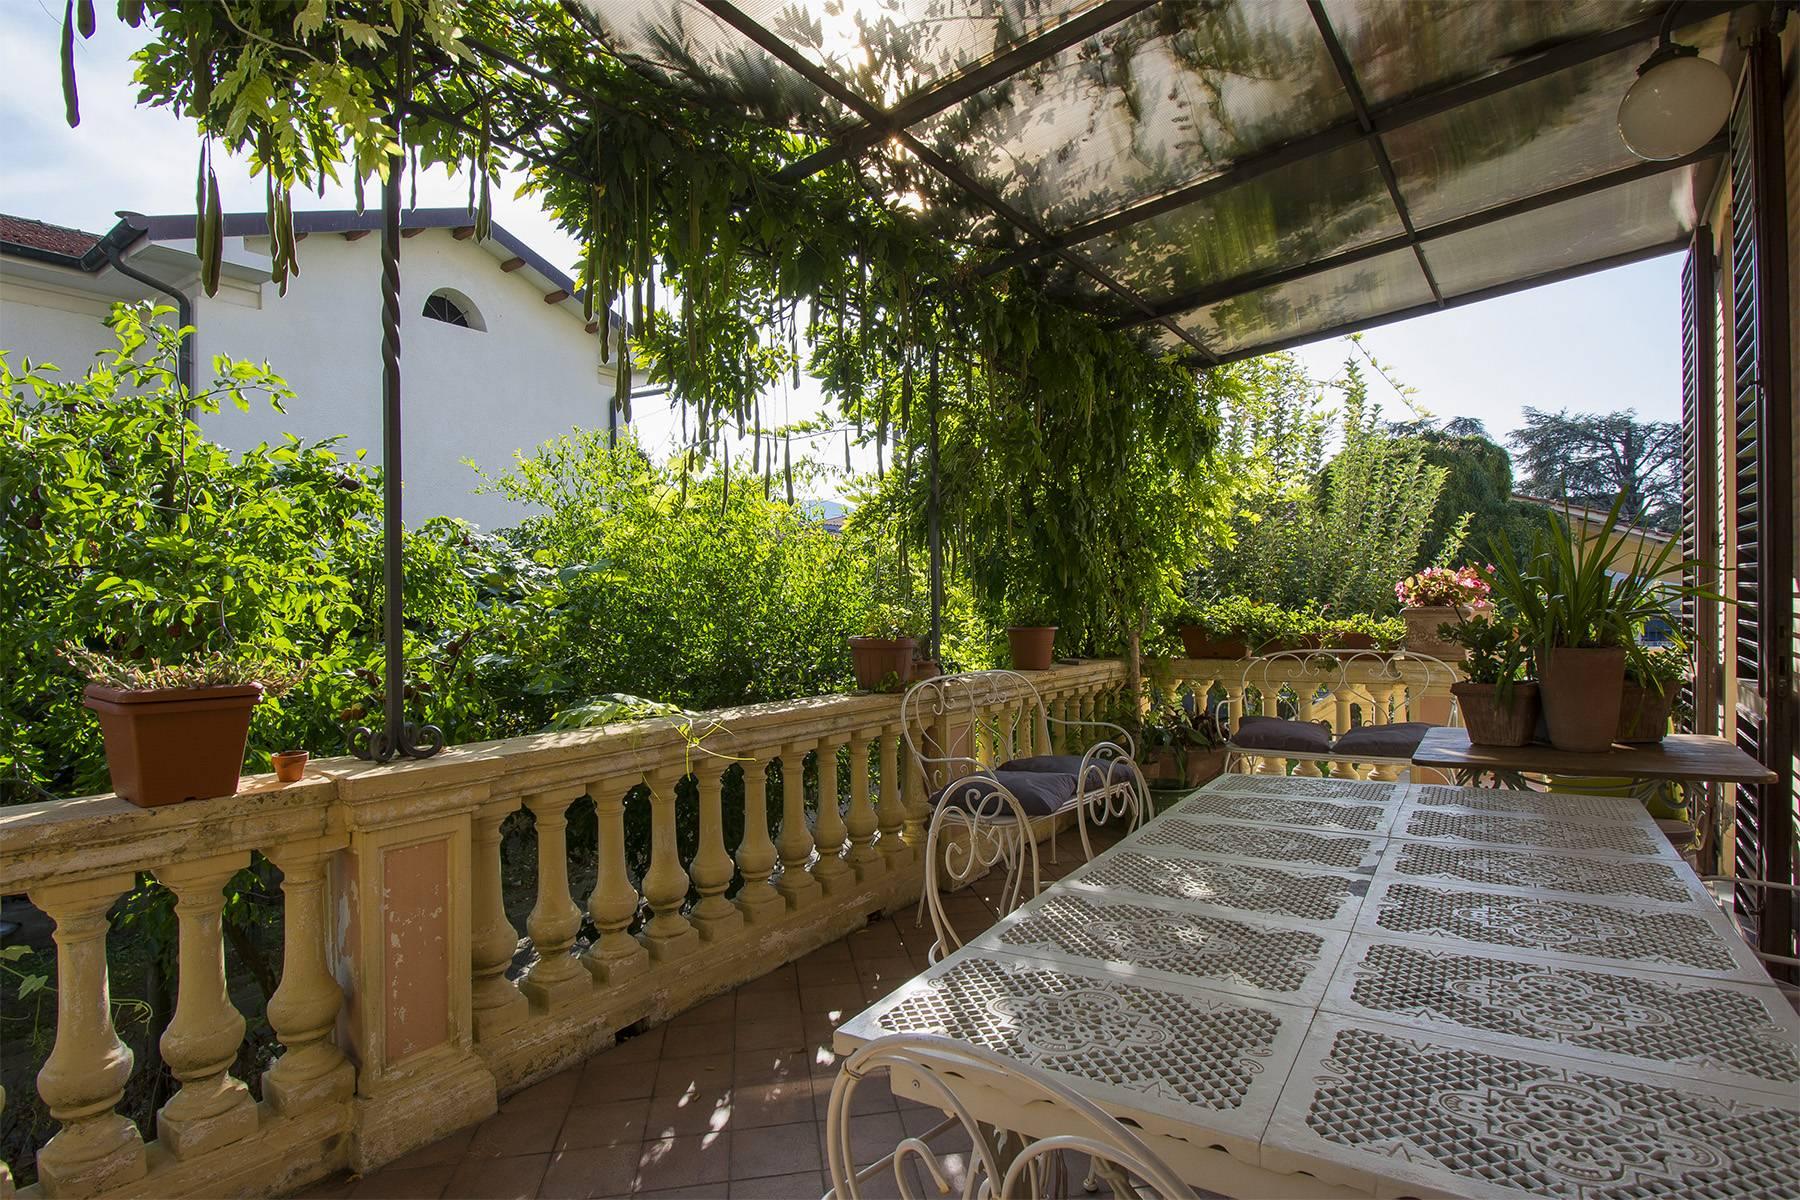 Villa in Vendita a Lucca: 5 locali, 350 mq - Foto 1